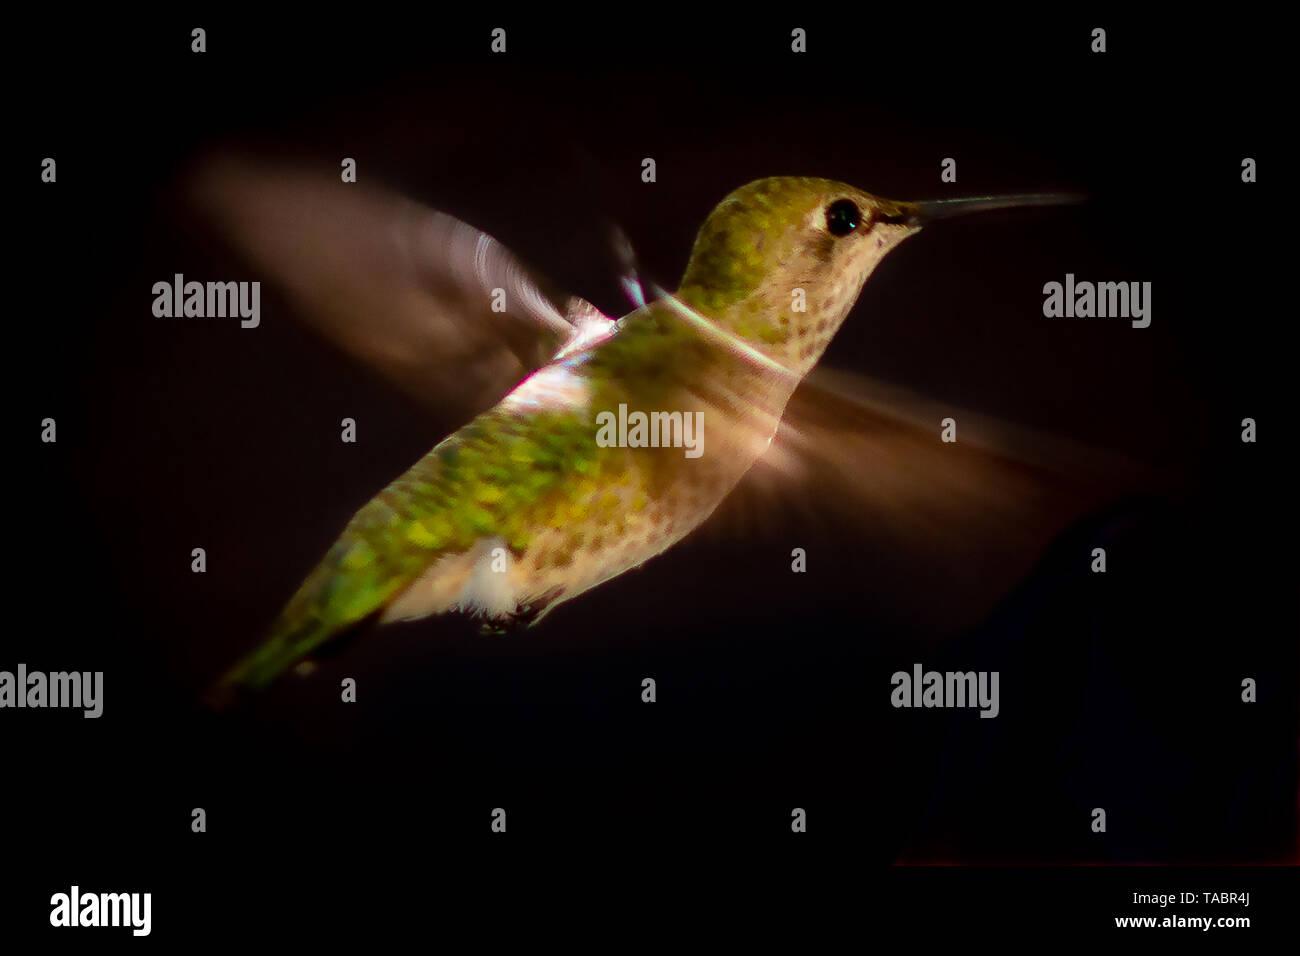 Hummingbird - Stock Image